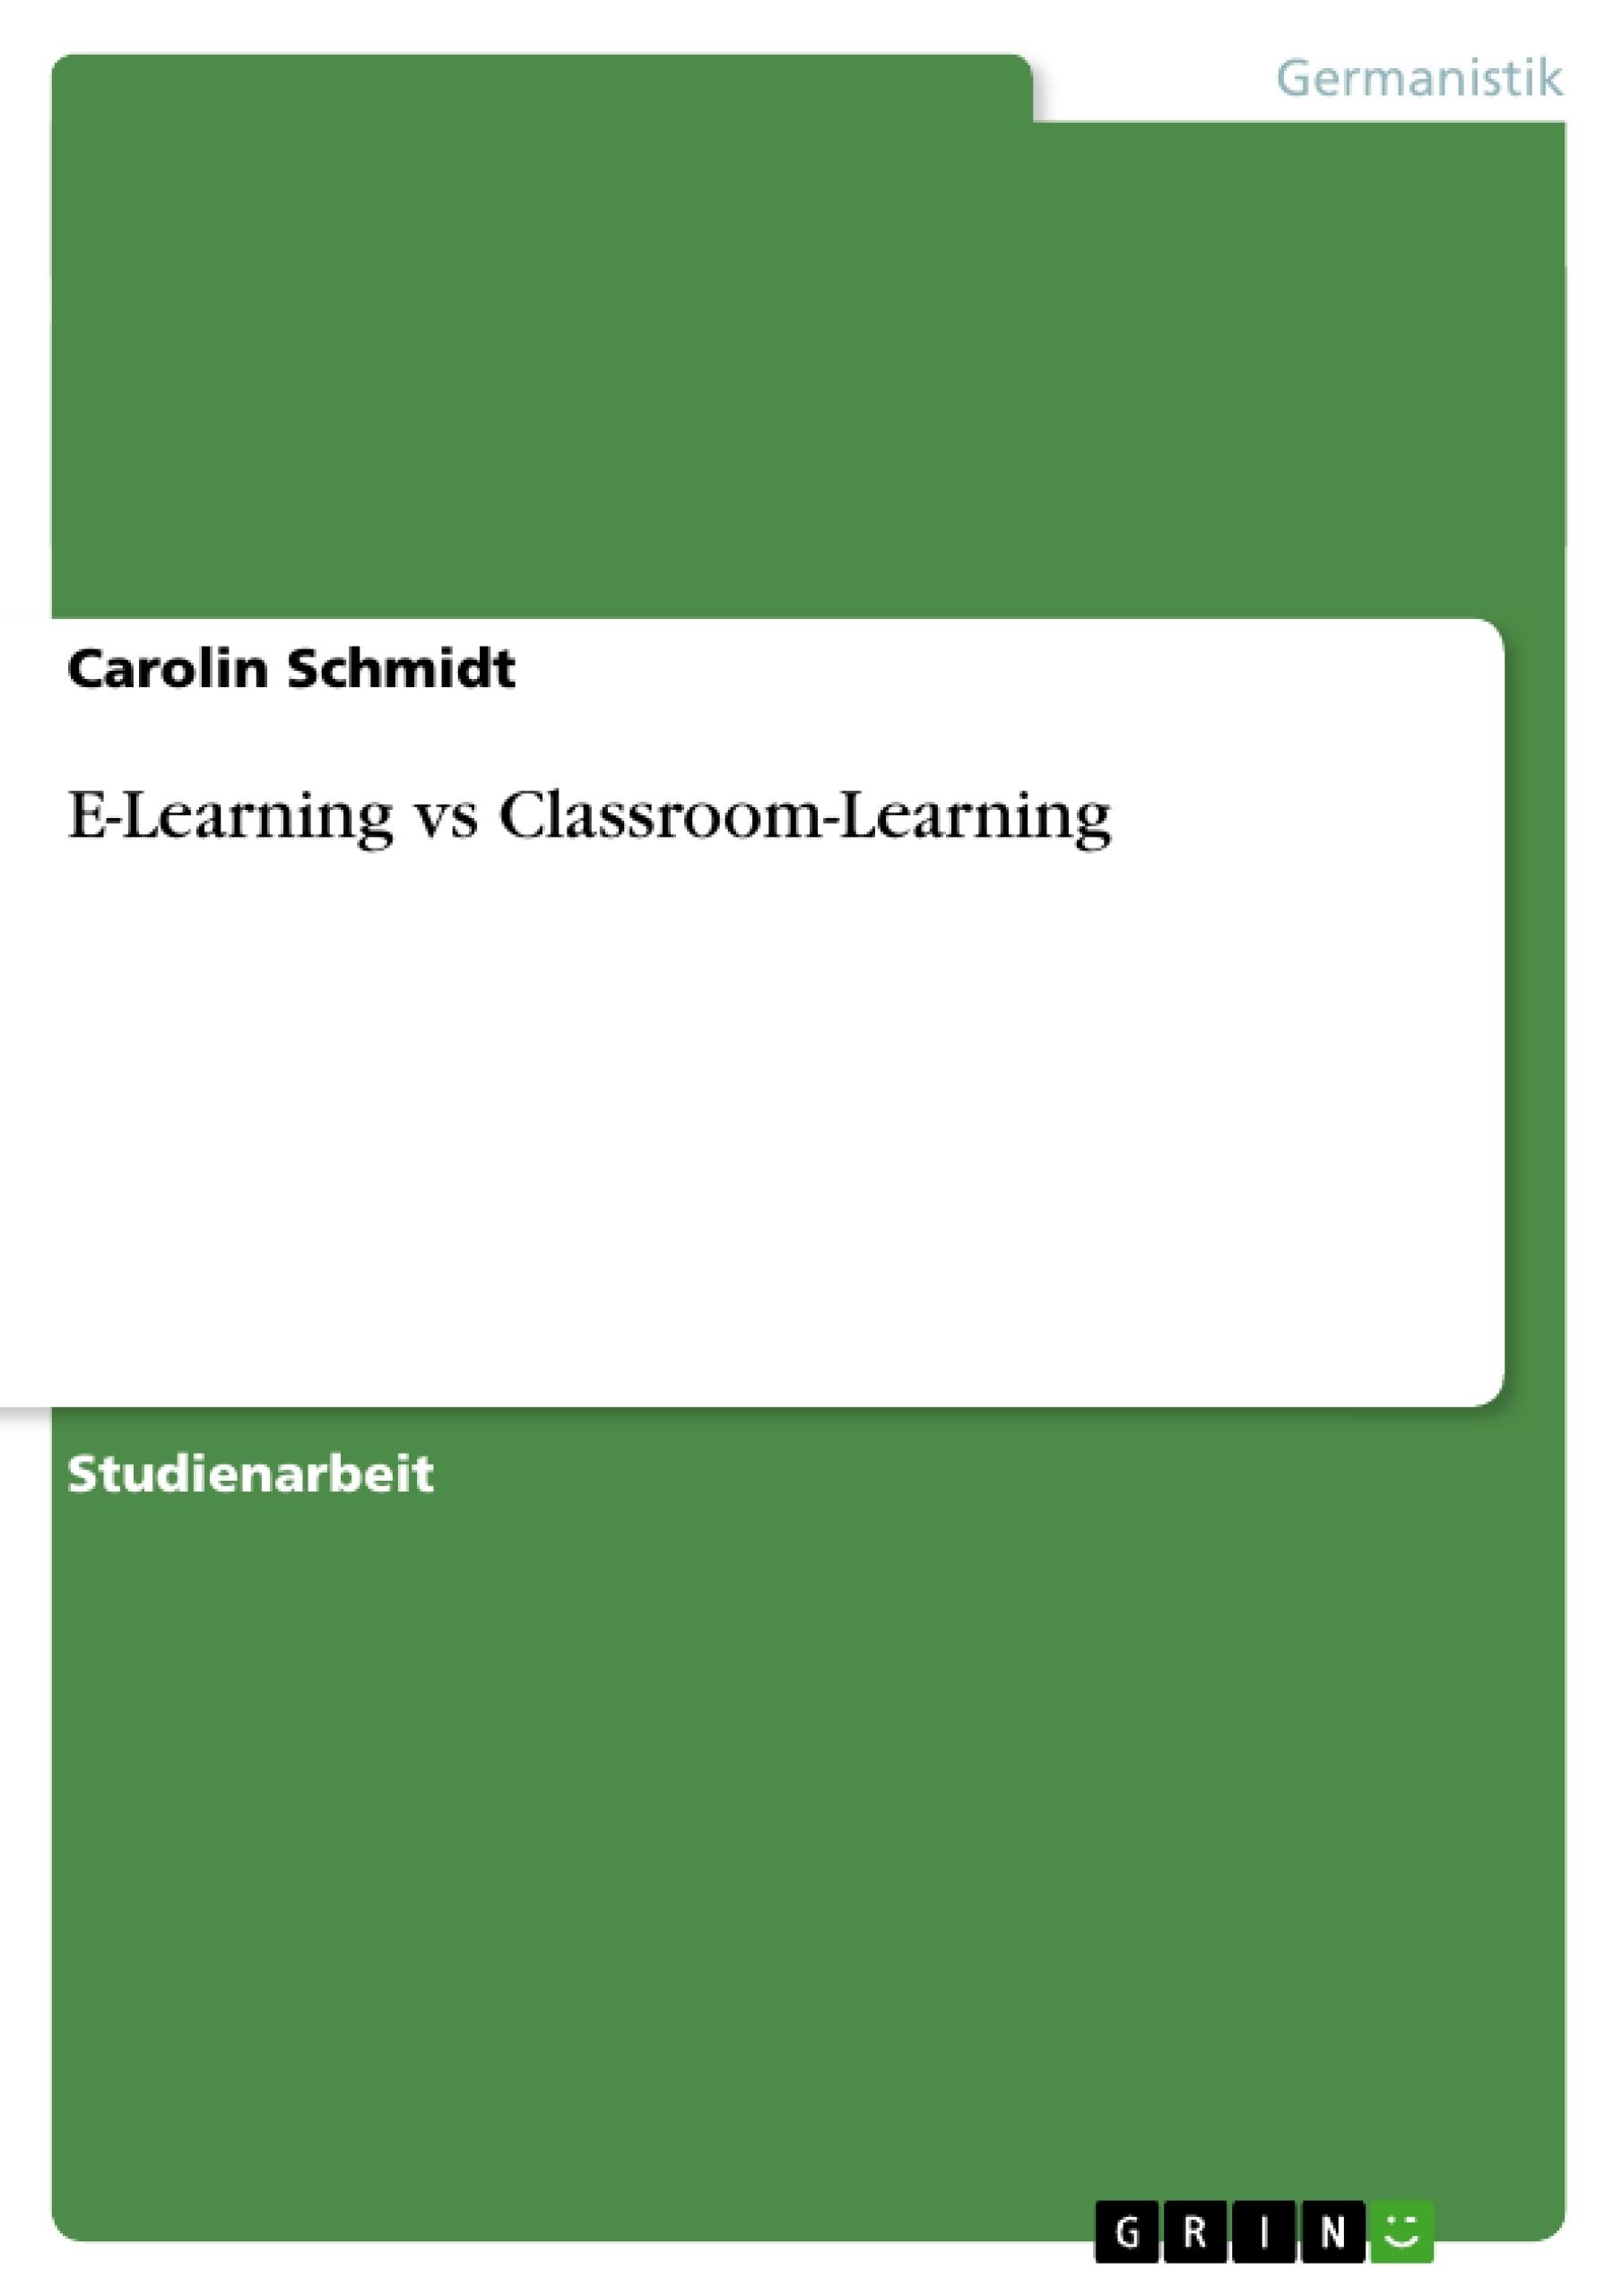 Titel: E-Learning vs Classroom-Learning